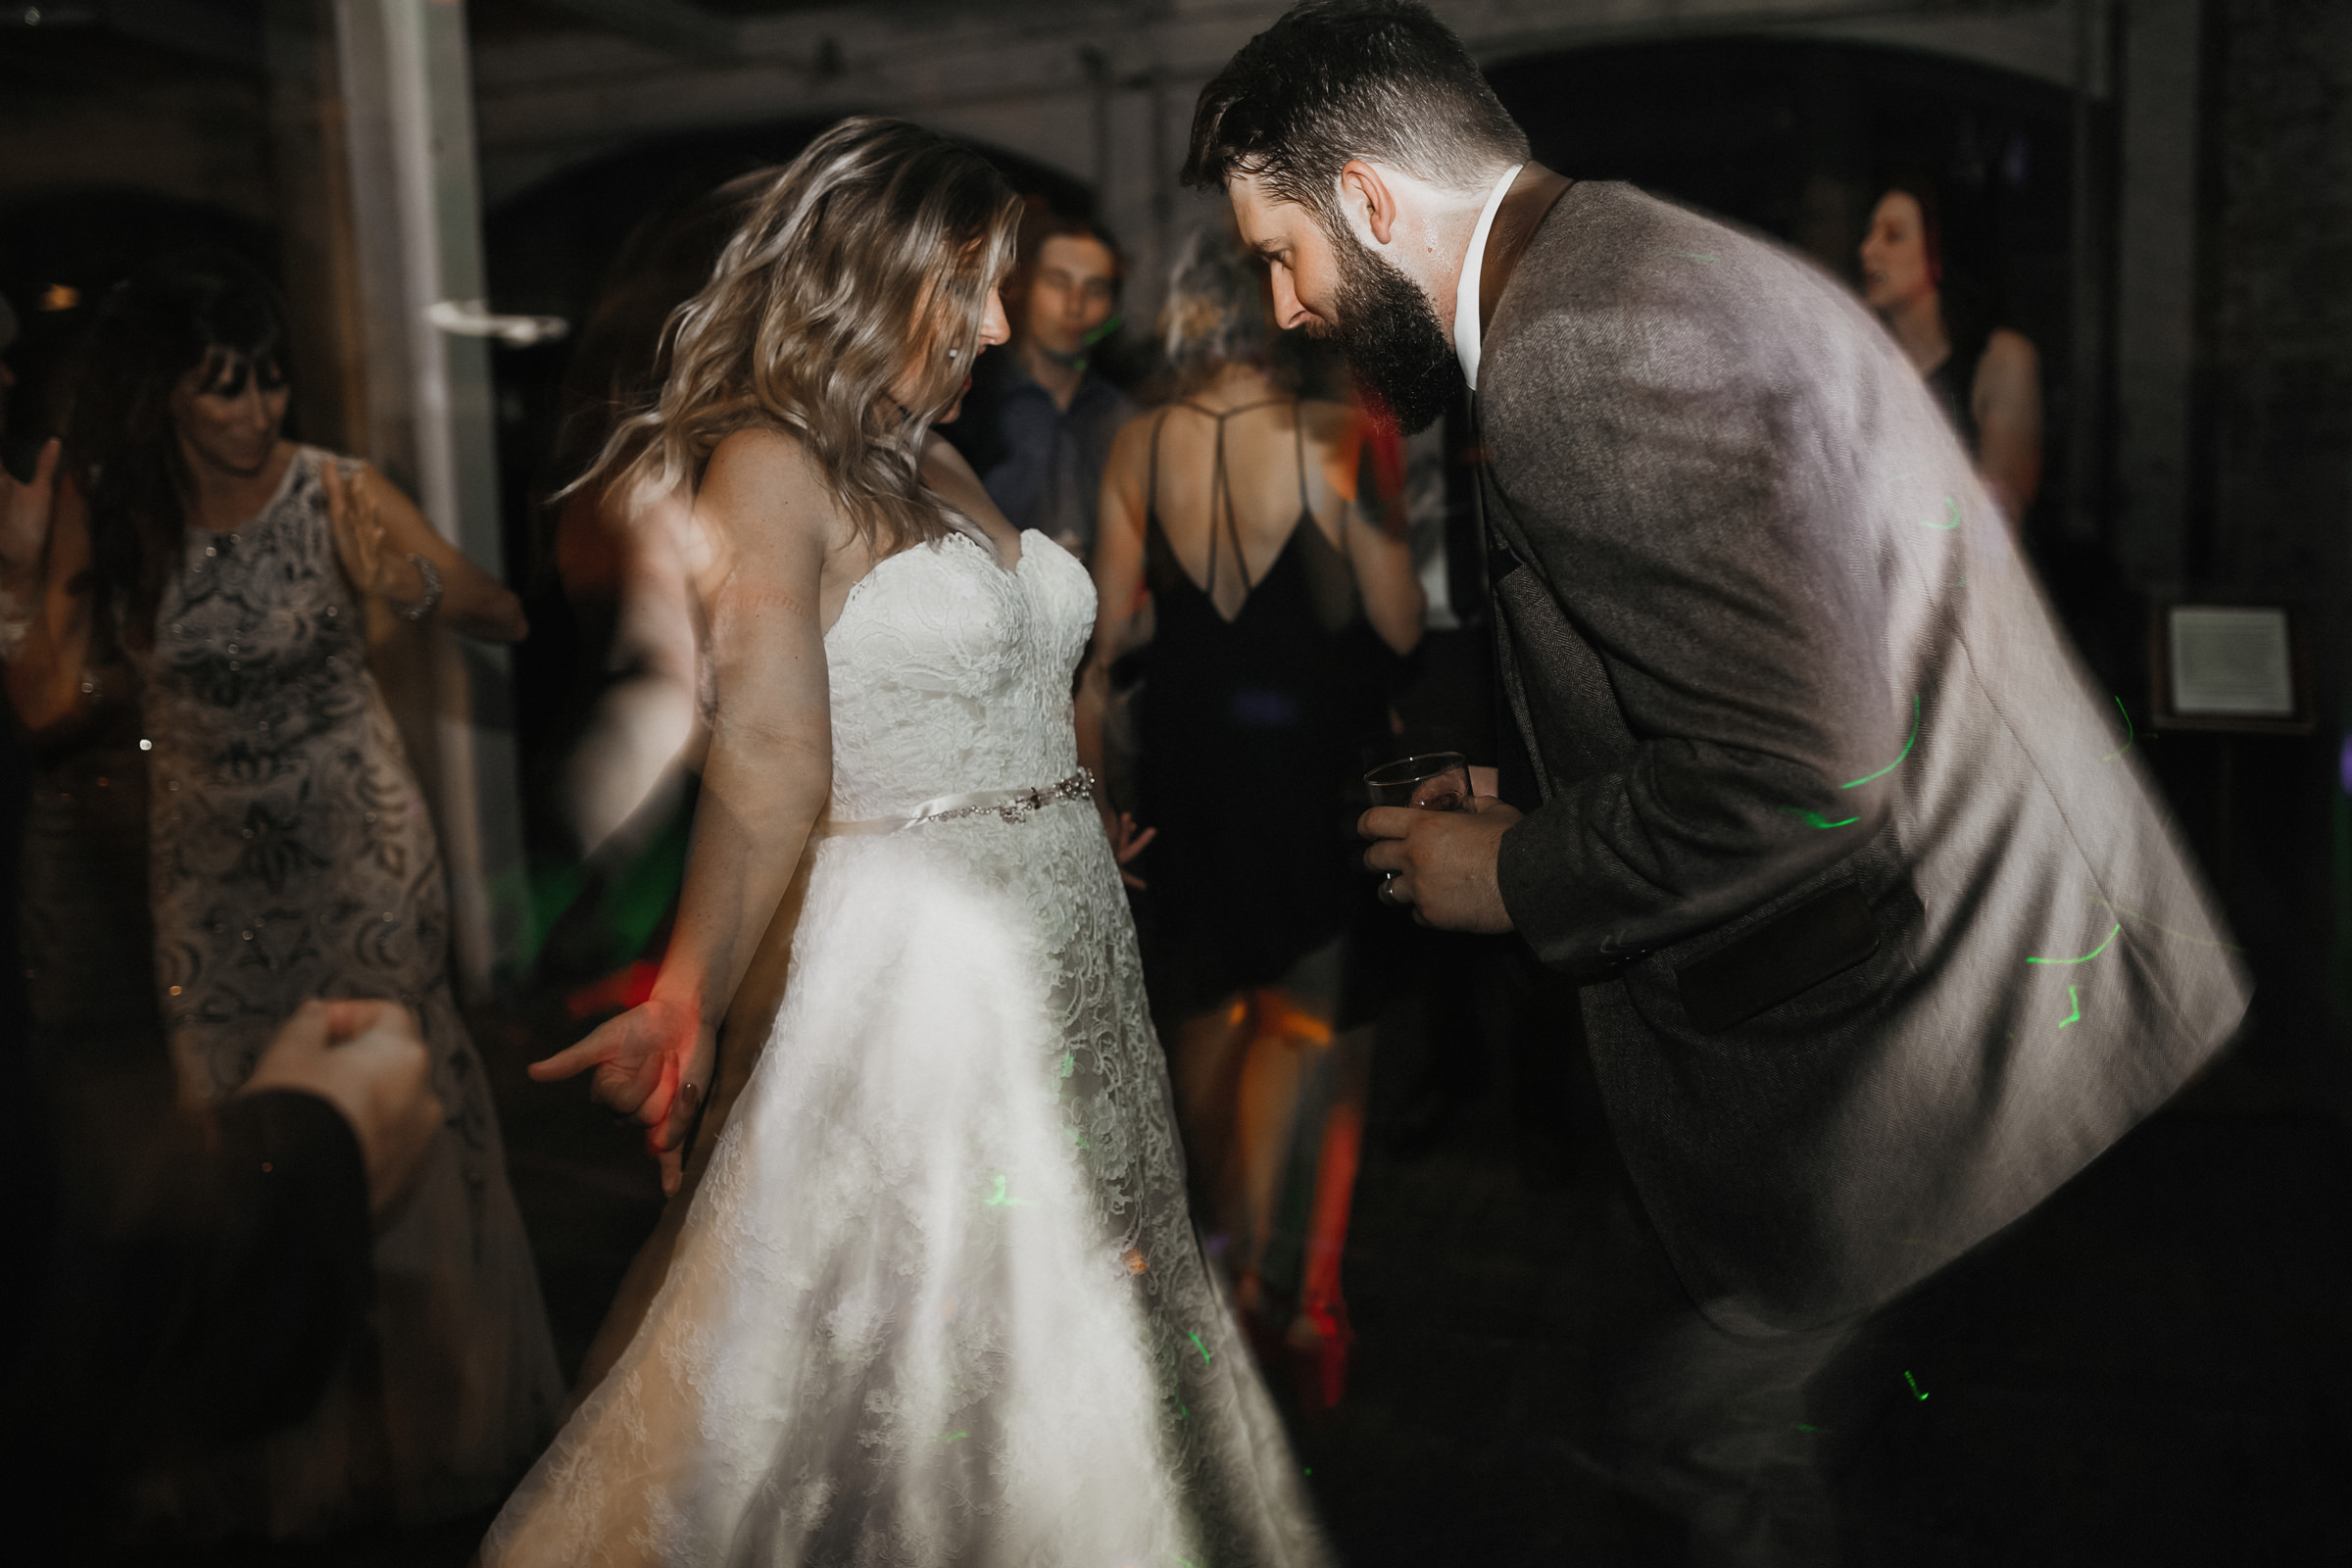 michigan-candid-wedding-photographer_31.jpg